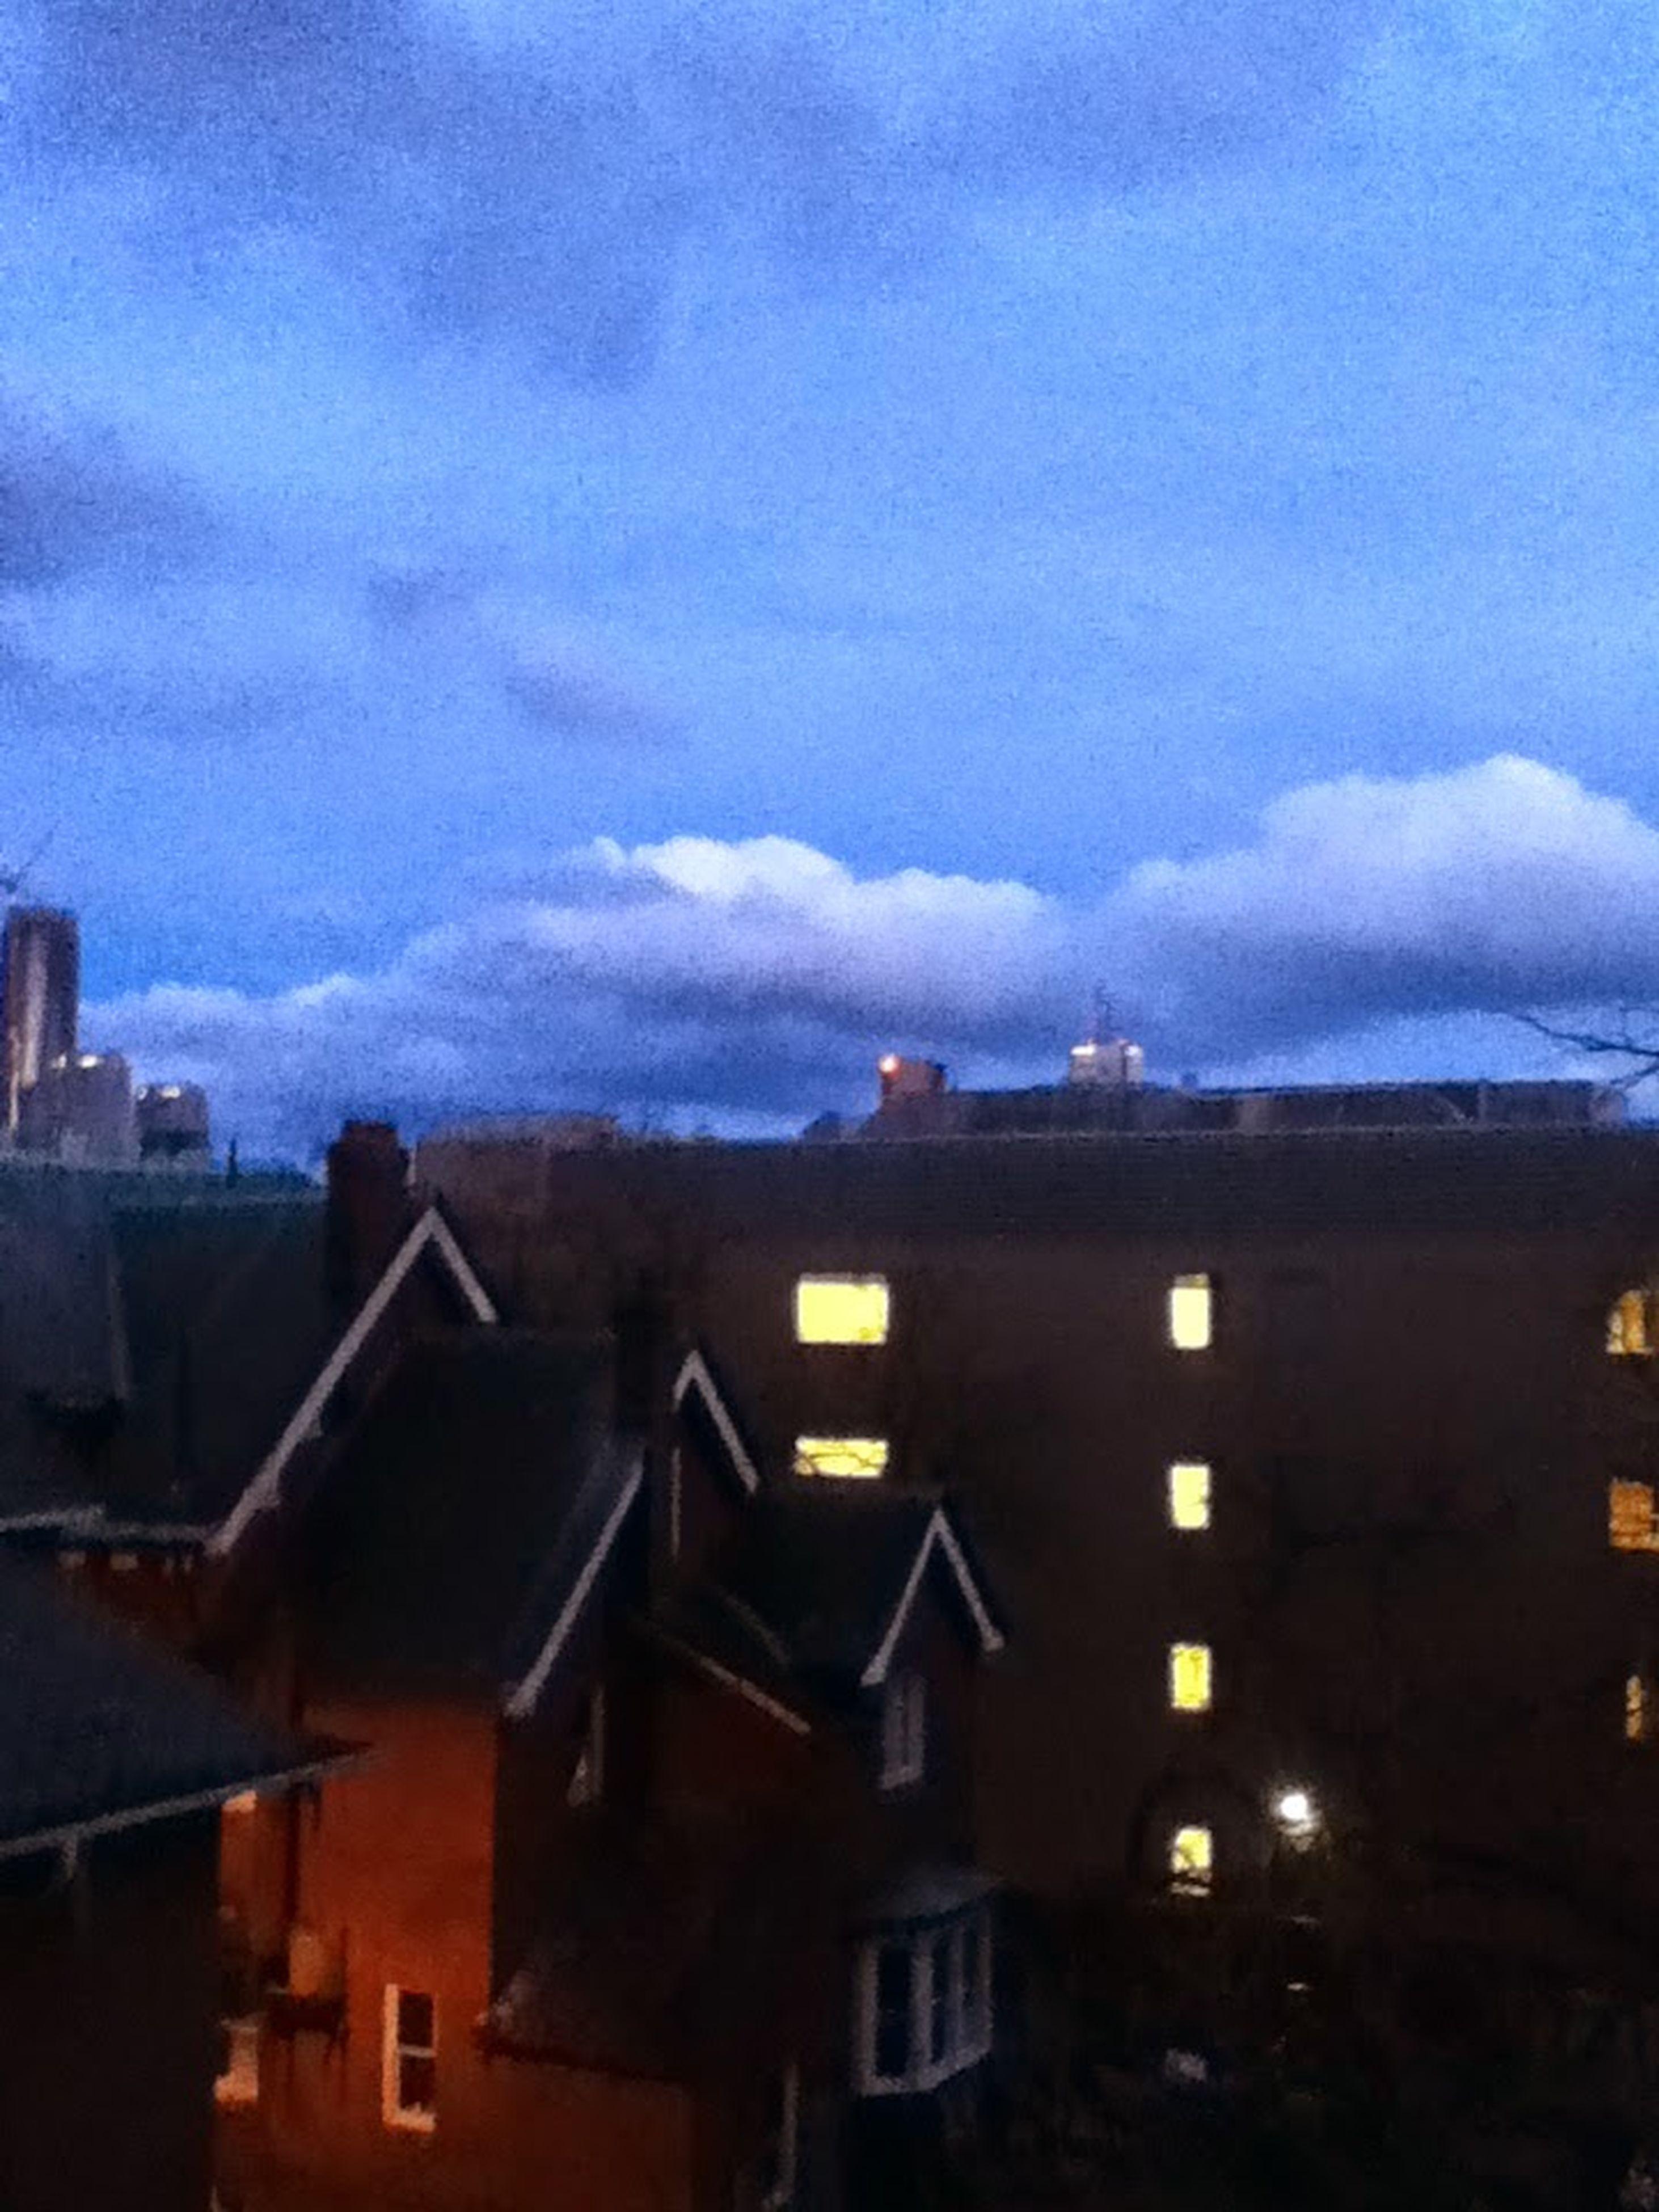 building exterior, architecture, built structure, sky, residential structure, house, cloud - sky, residential building, city, roof, weather, dusk, residential district, cloud, cloudy, town, building, blue, outdoors, cityscape